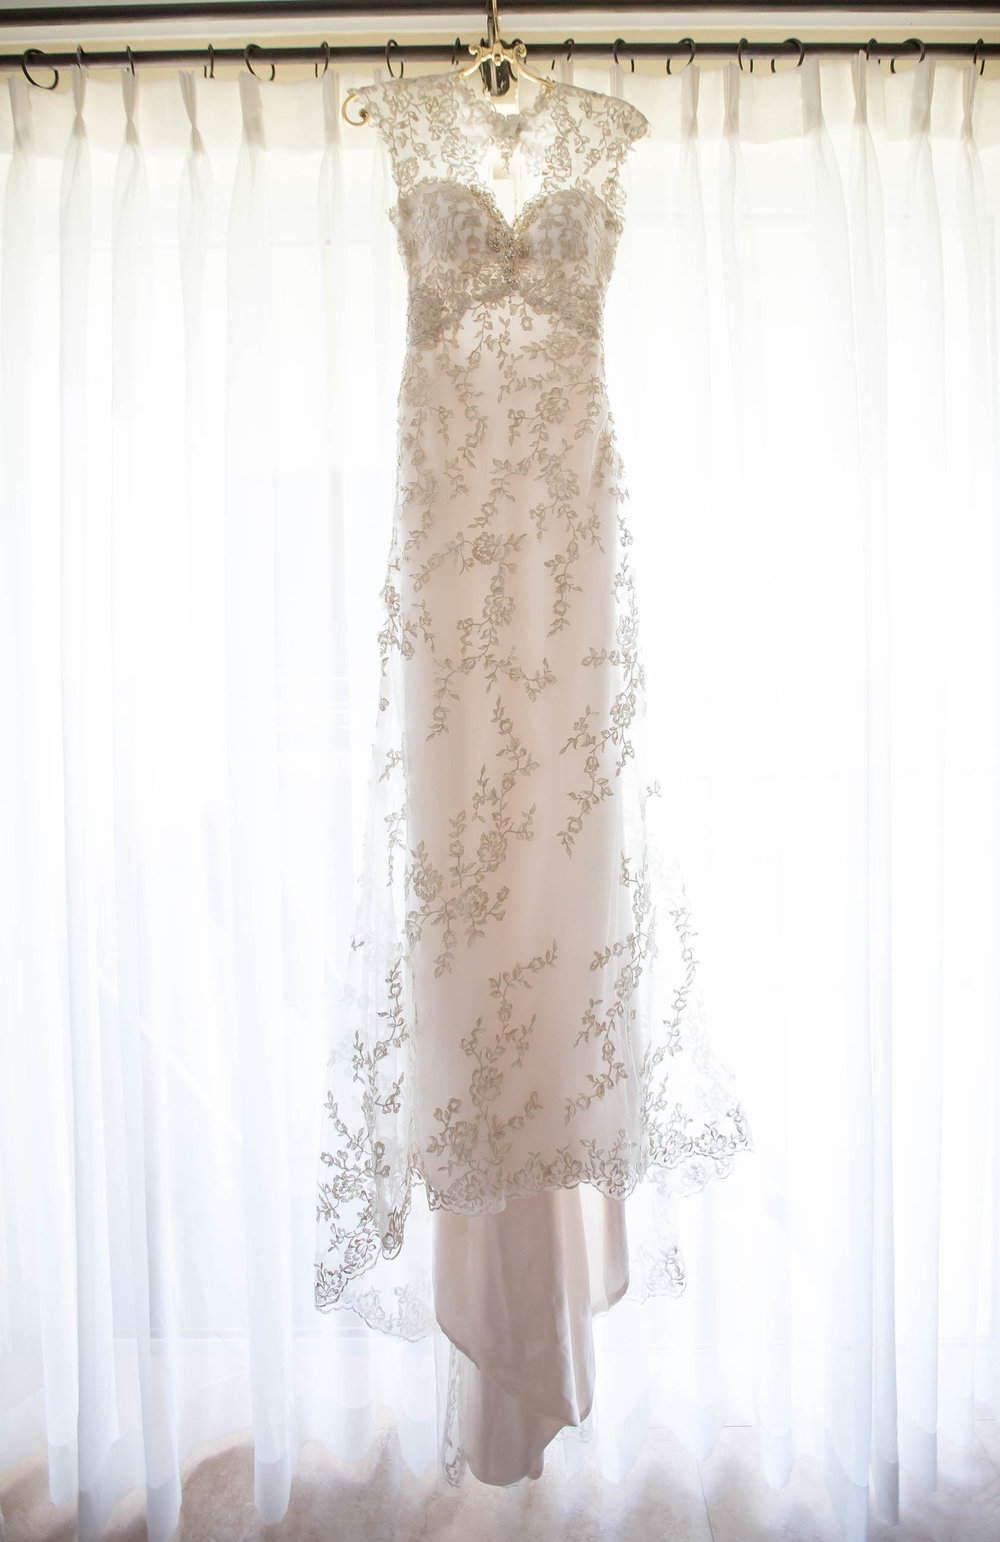 dress_hanging_mutiny_hotel_coconut_grove_tiny_house_photo.jpg